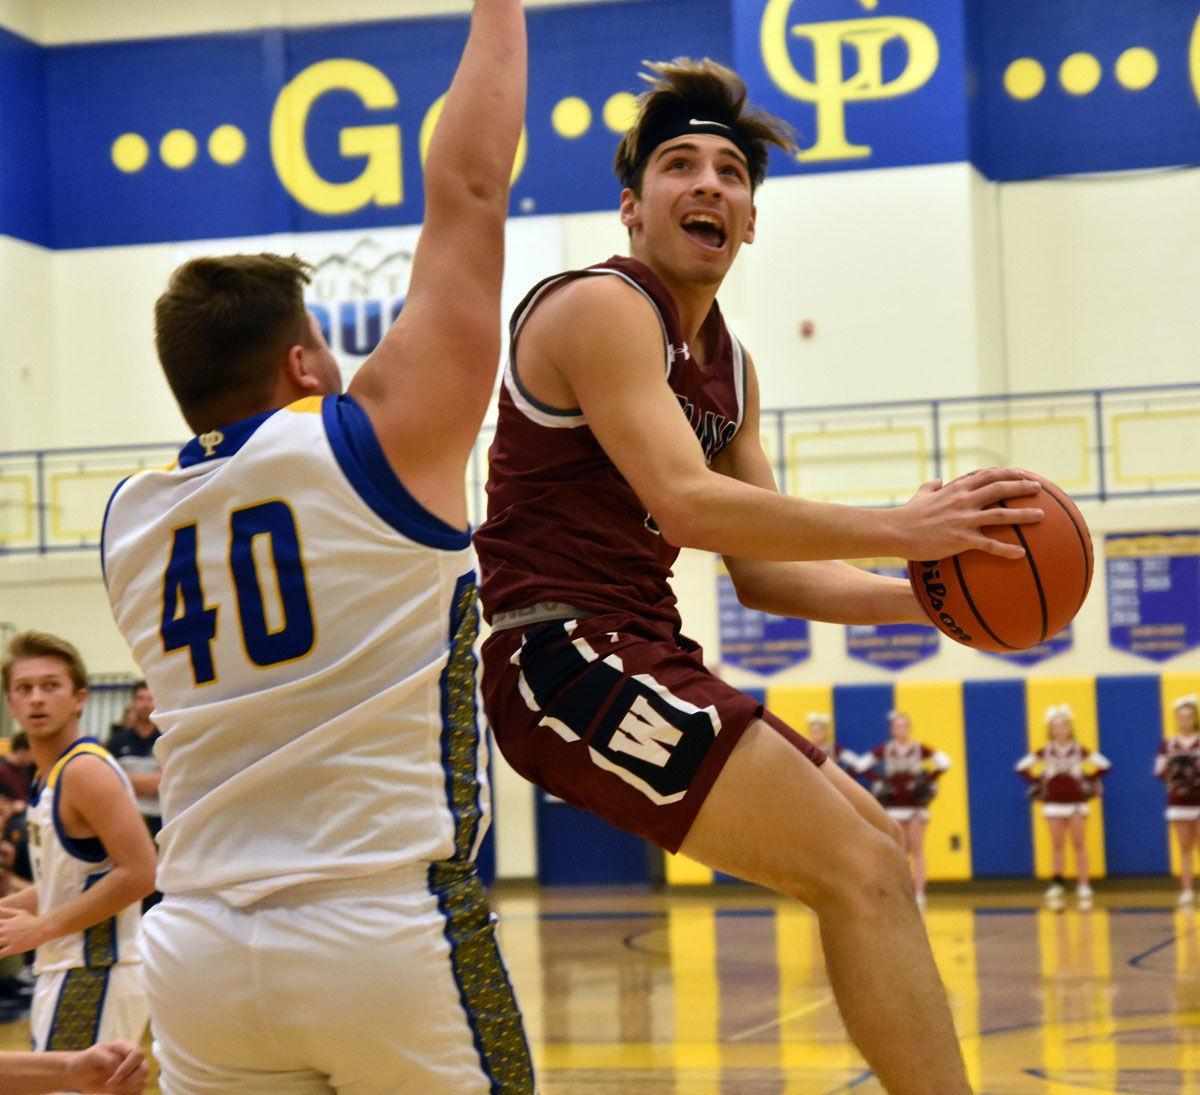 Morristown West overcomes foul troubles to defeat Gatlinburg-Pittman